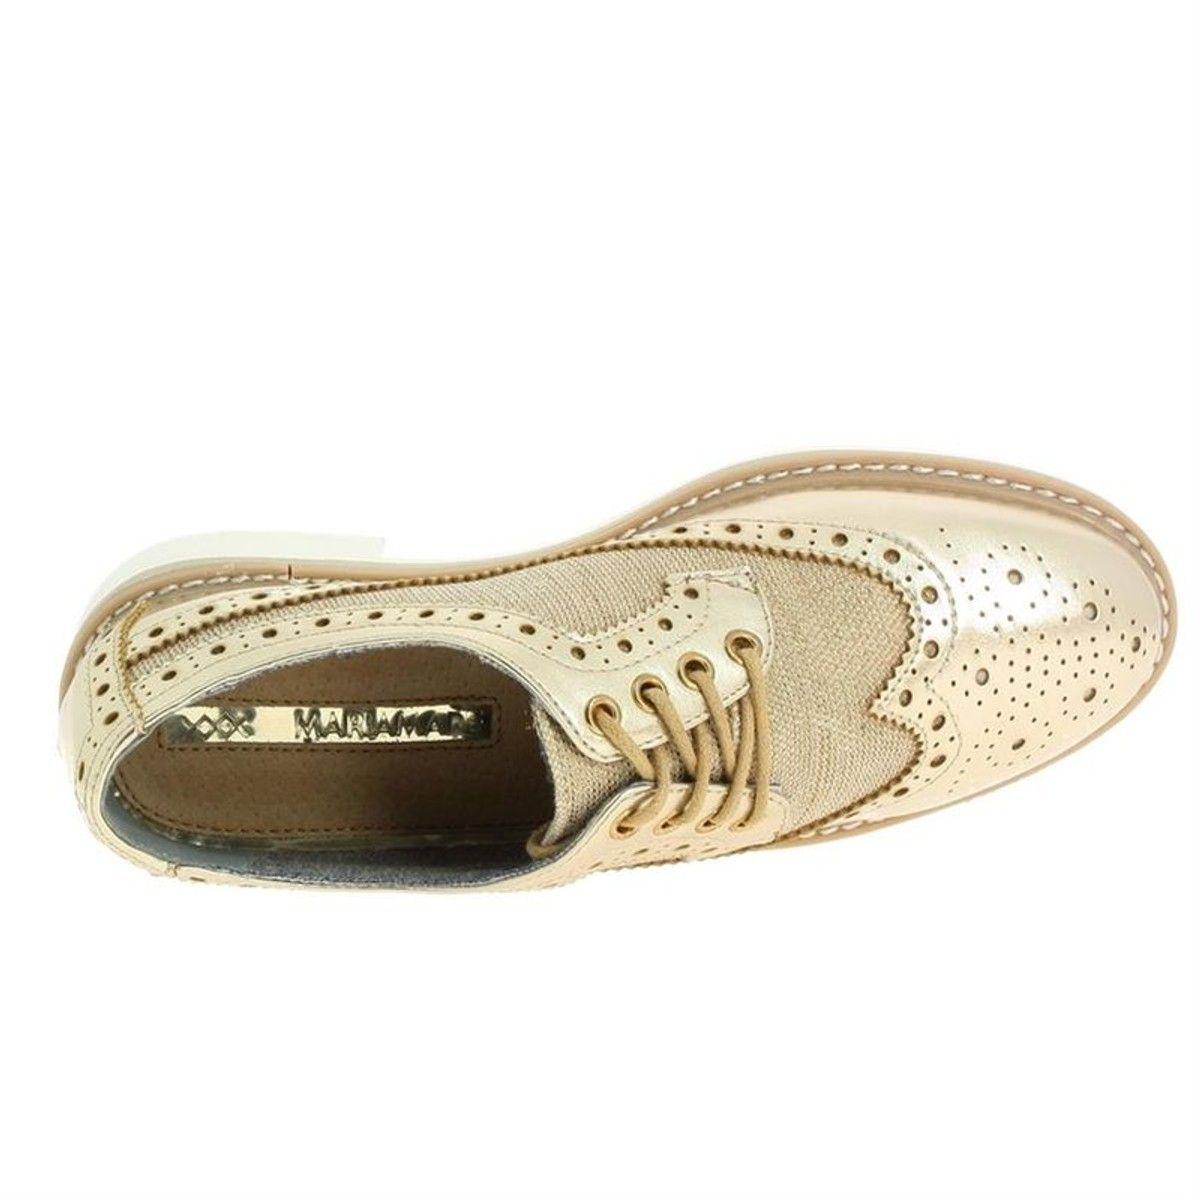 Chaussures À Lacets Synthétique Taille : 36;38;39;40;41